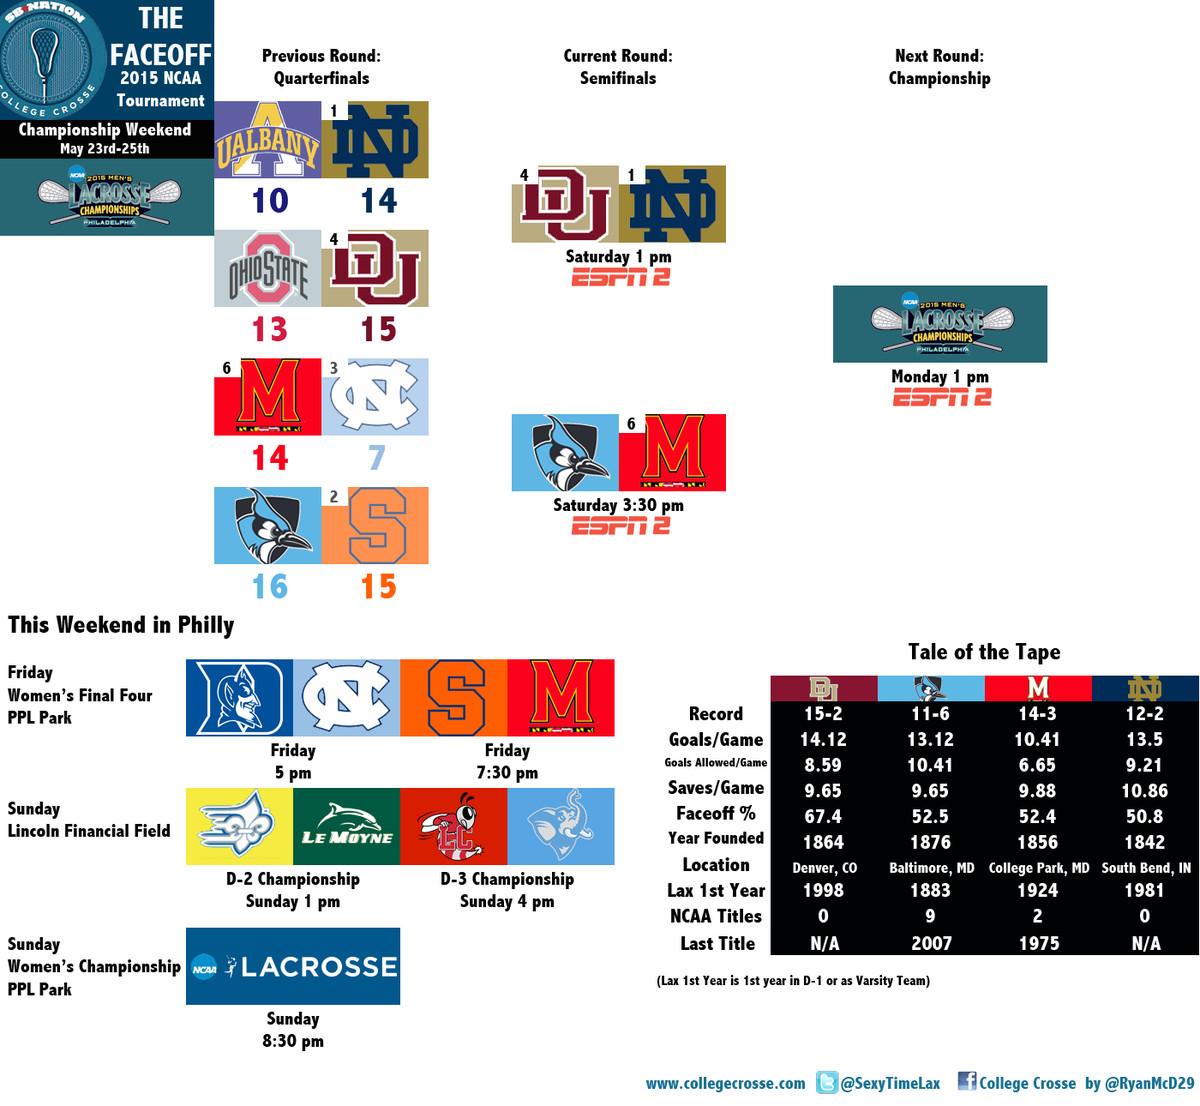 THE FACEOFF 2015 NCAA Final Four